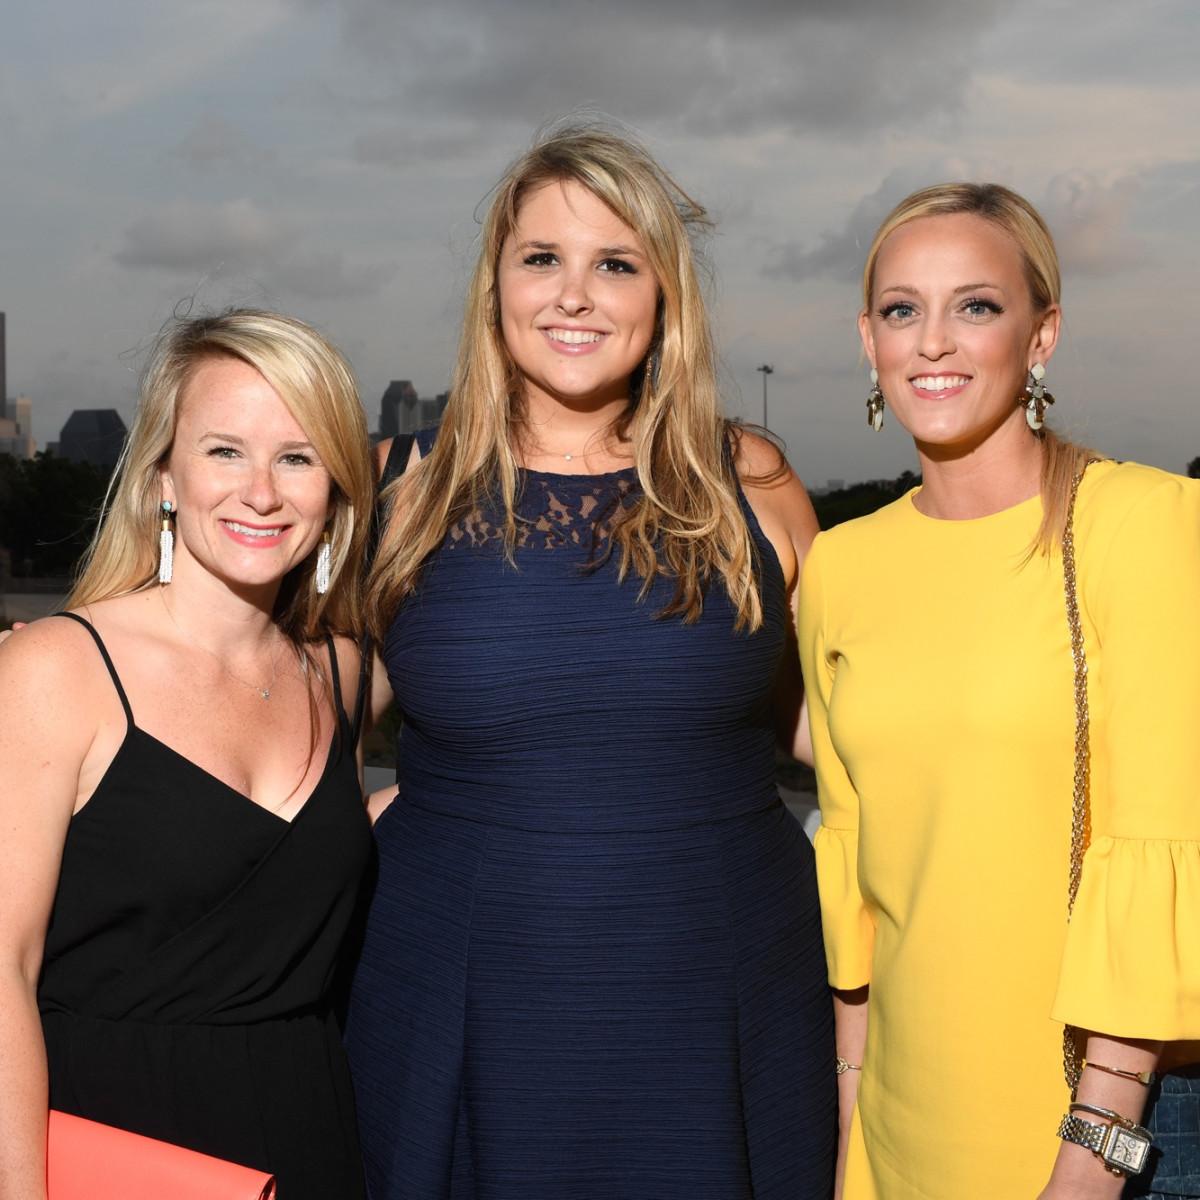 Emily White, Natali Czarneski, Courtney Sutton at Barbara Bush Foundation kickoff